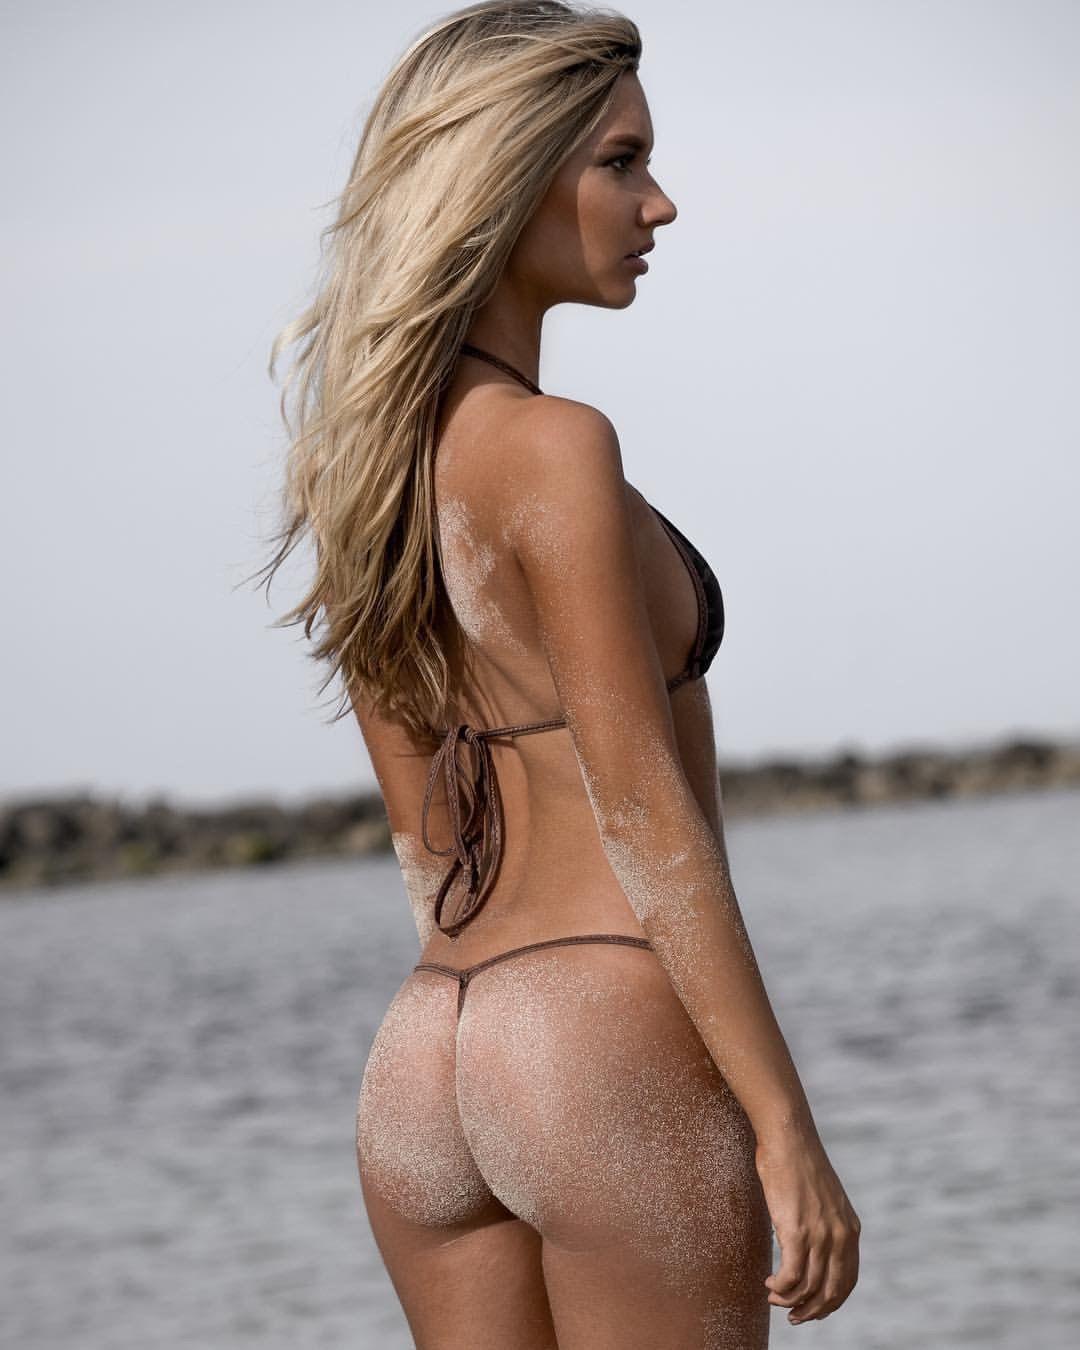 ba3a6132fb8 Alexa Collins Bikini Swimsuit